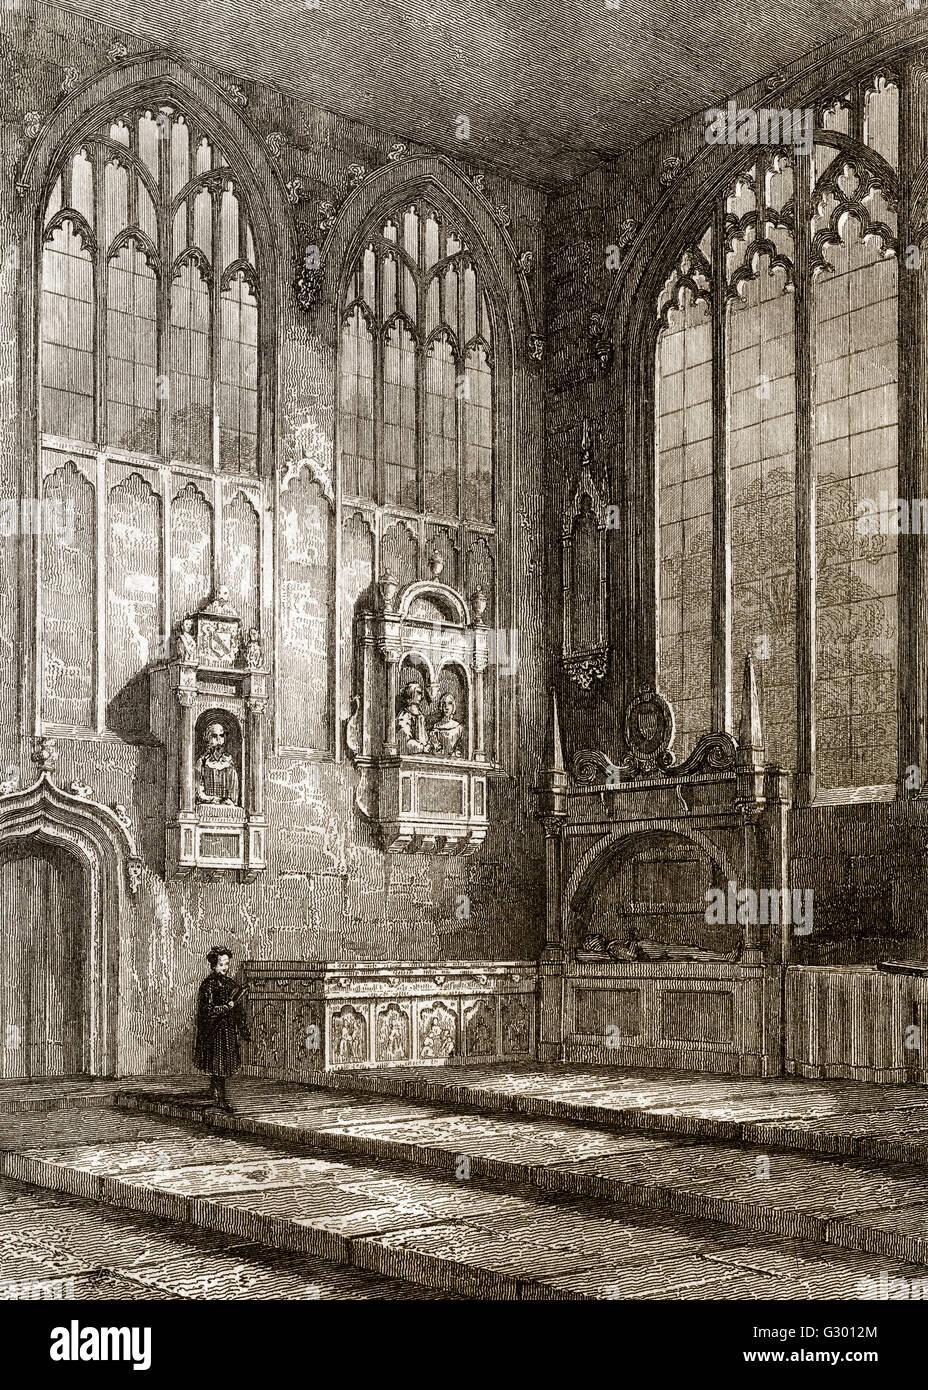 The Shakespeare funerary monument,  Holy Trinity Church, Stratford-upon-Avon, England - Stock Image